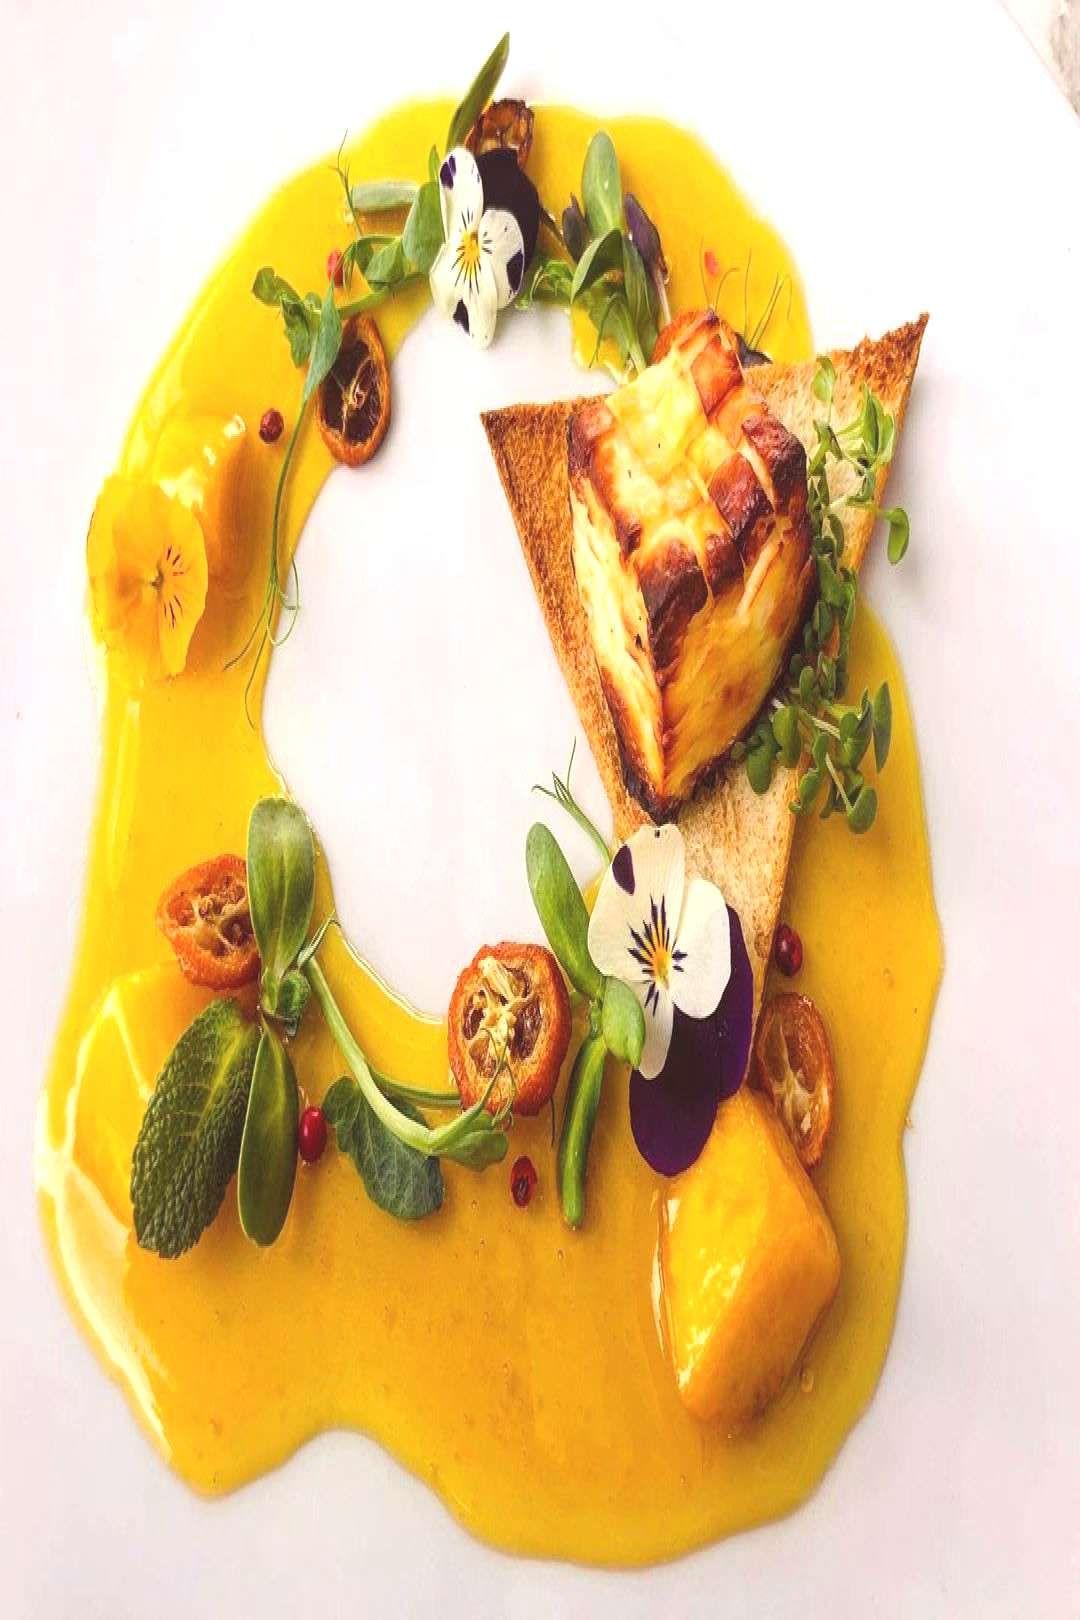 #cypruscooking #sweet #salty #icomo #when #meet #chef #food #the #fo | When the sweet meet the salty | #icomo #cypruscooking #chef #foYou can find Food quotes and more on our website.| When the sweet meet the salty | #icomo #cypruscooking #chef #fo